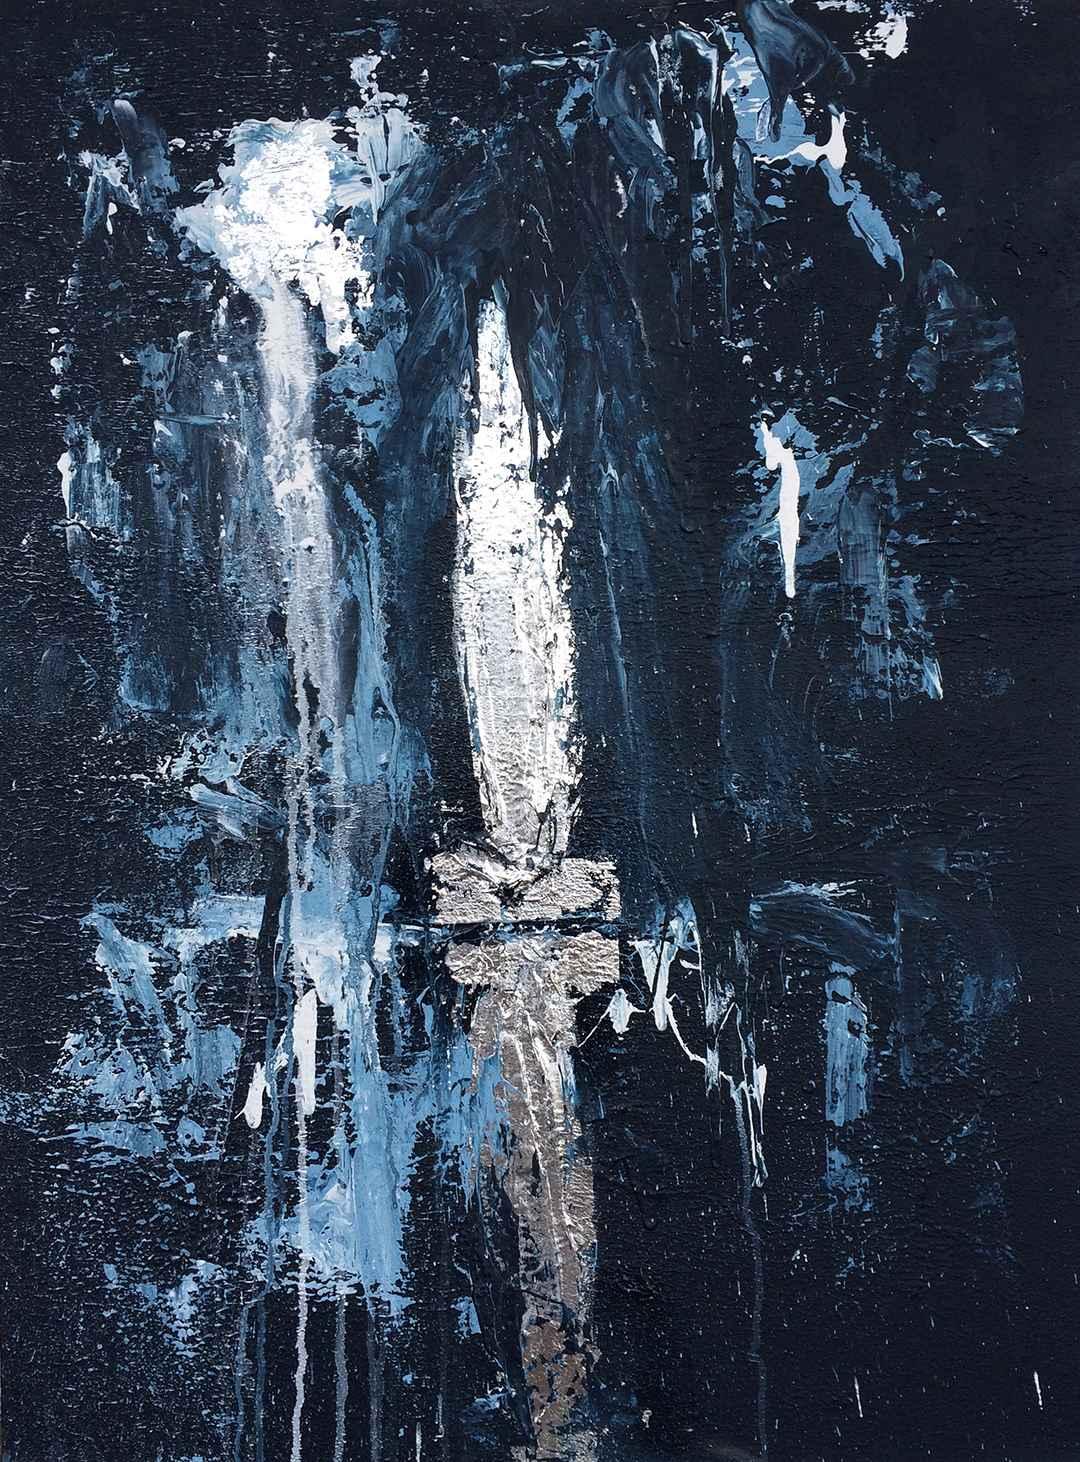 Starry Night by  Steve Lyons - Masterpiece Online